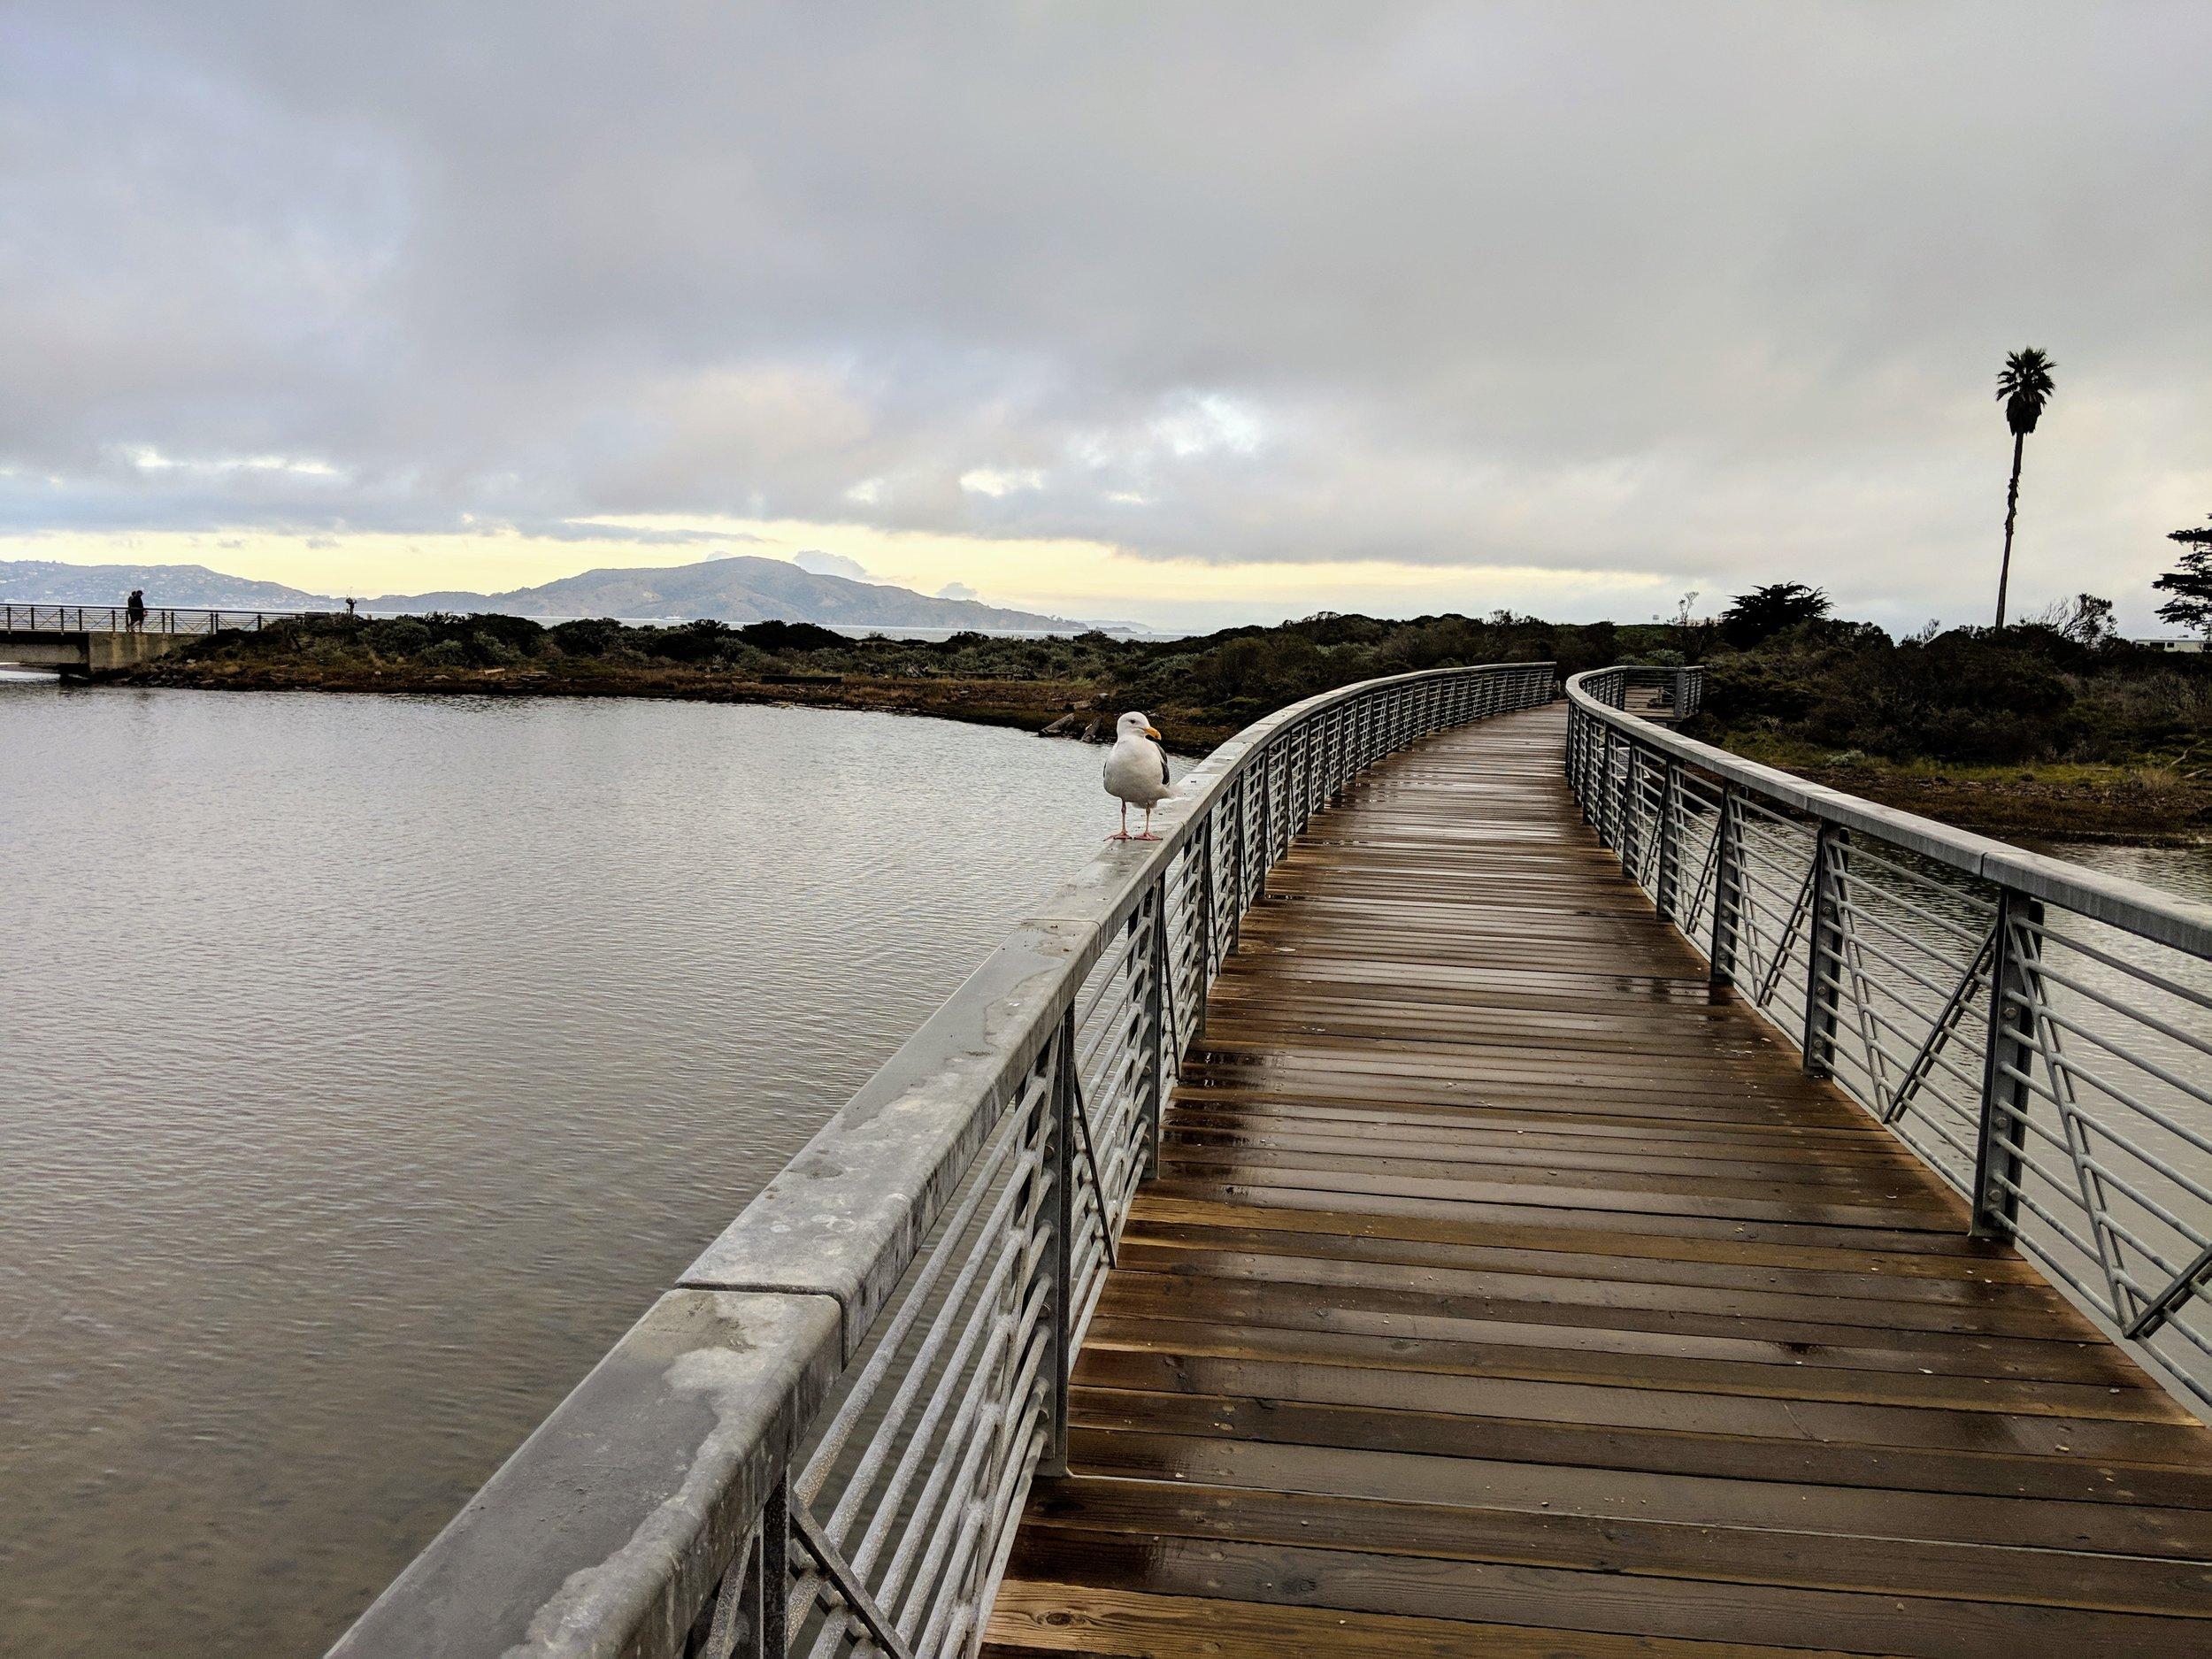 Presidio - at Chrissy Field Beach